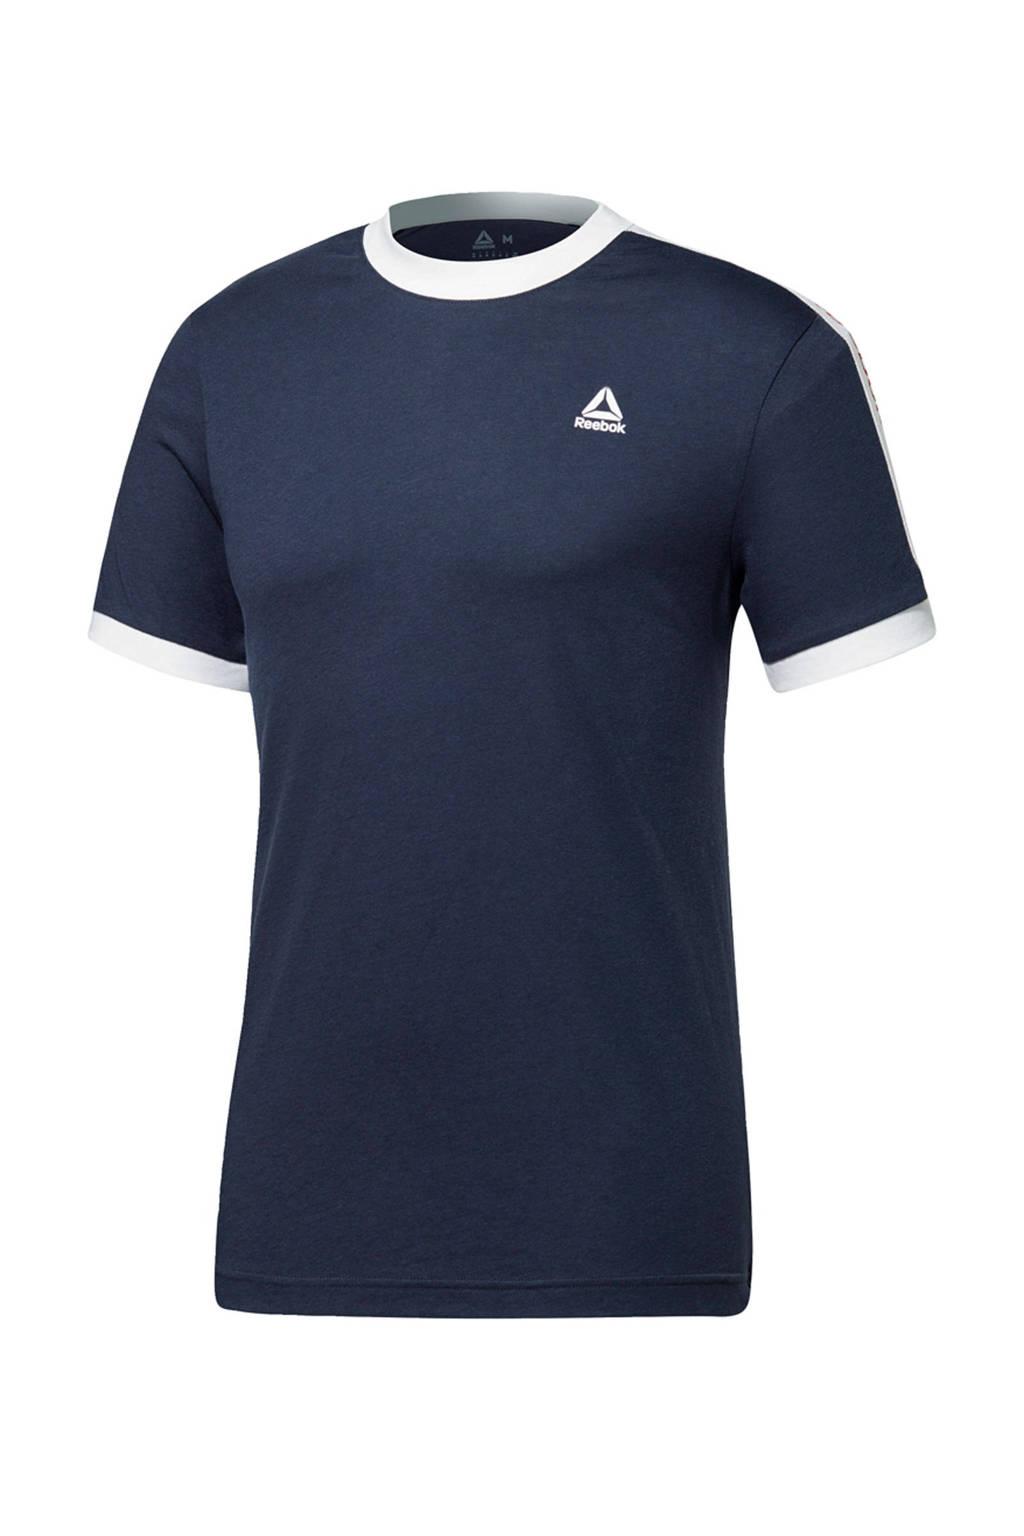 Reebok   sport T-shirt donkerblauw, Donkerblauw